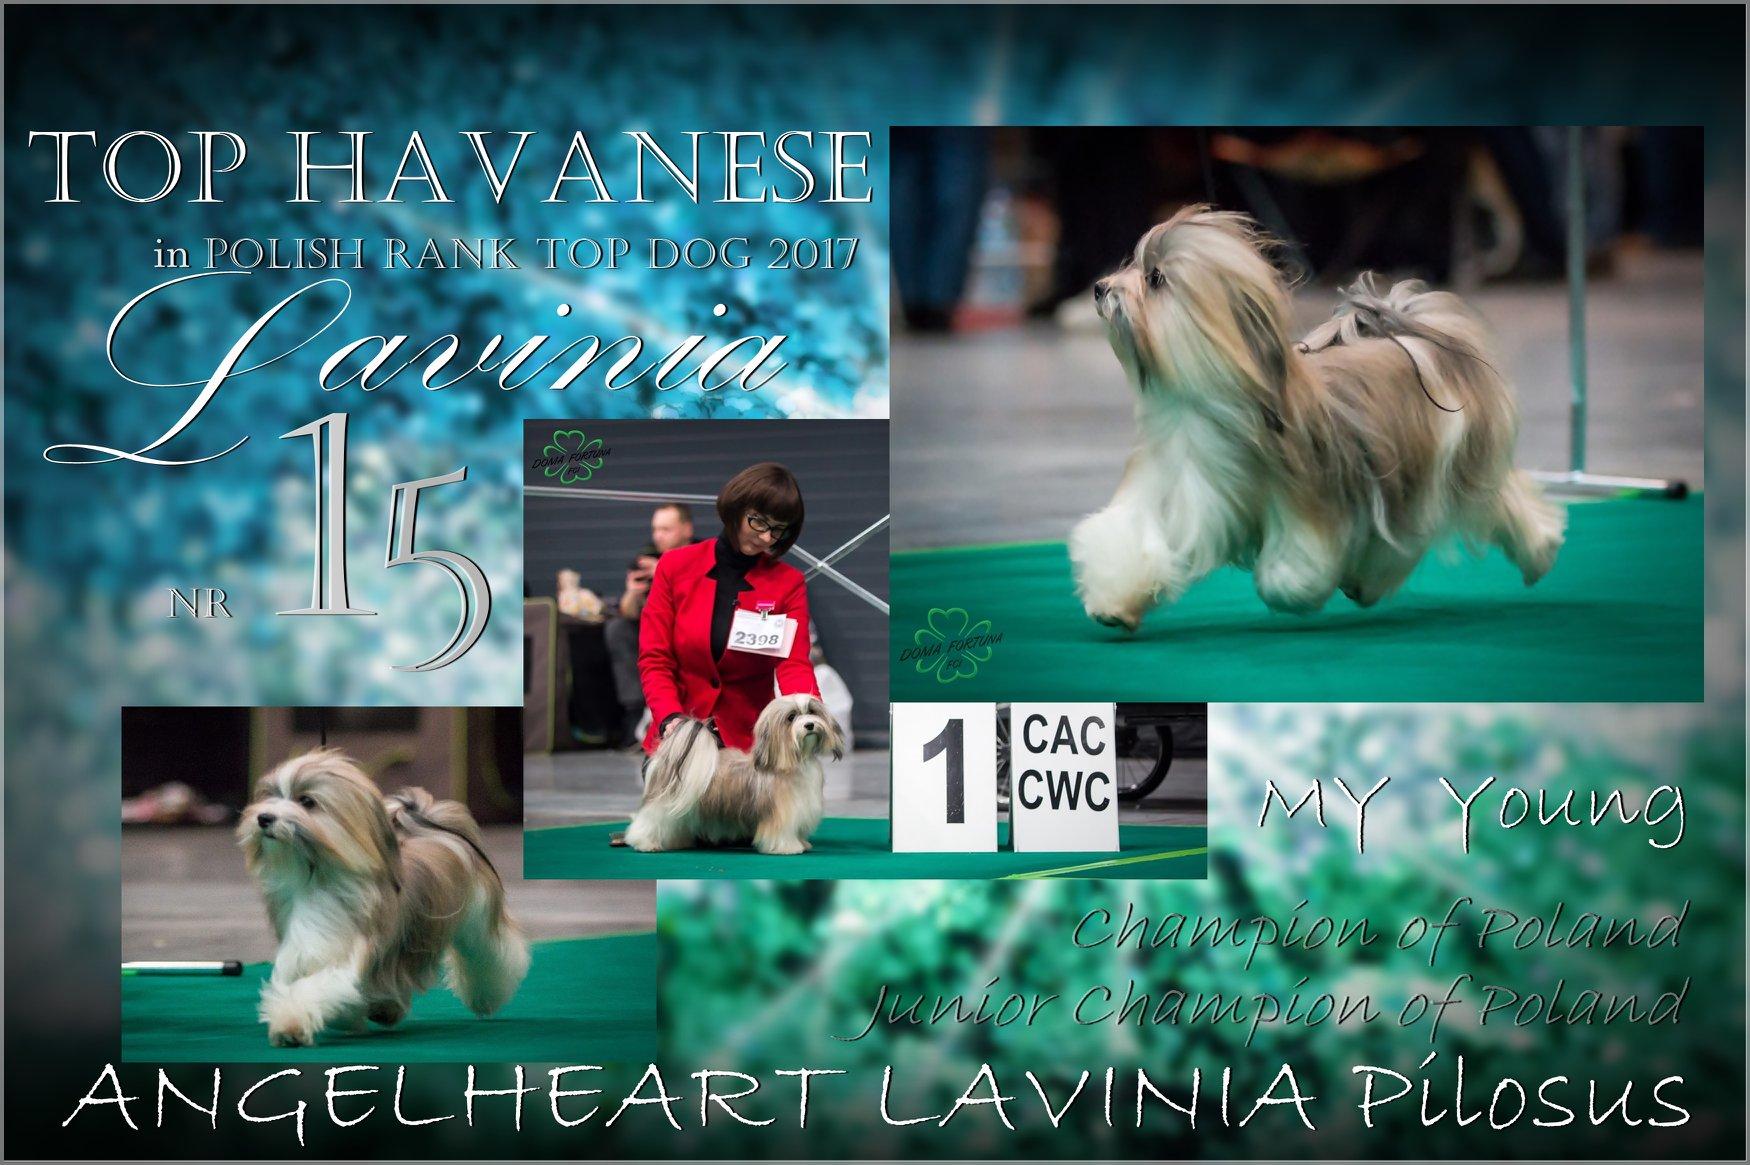 ANGELHEART Lavinia Pilosus Hawańczyk